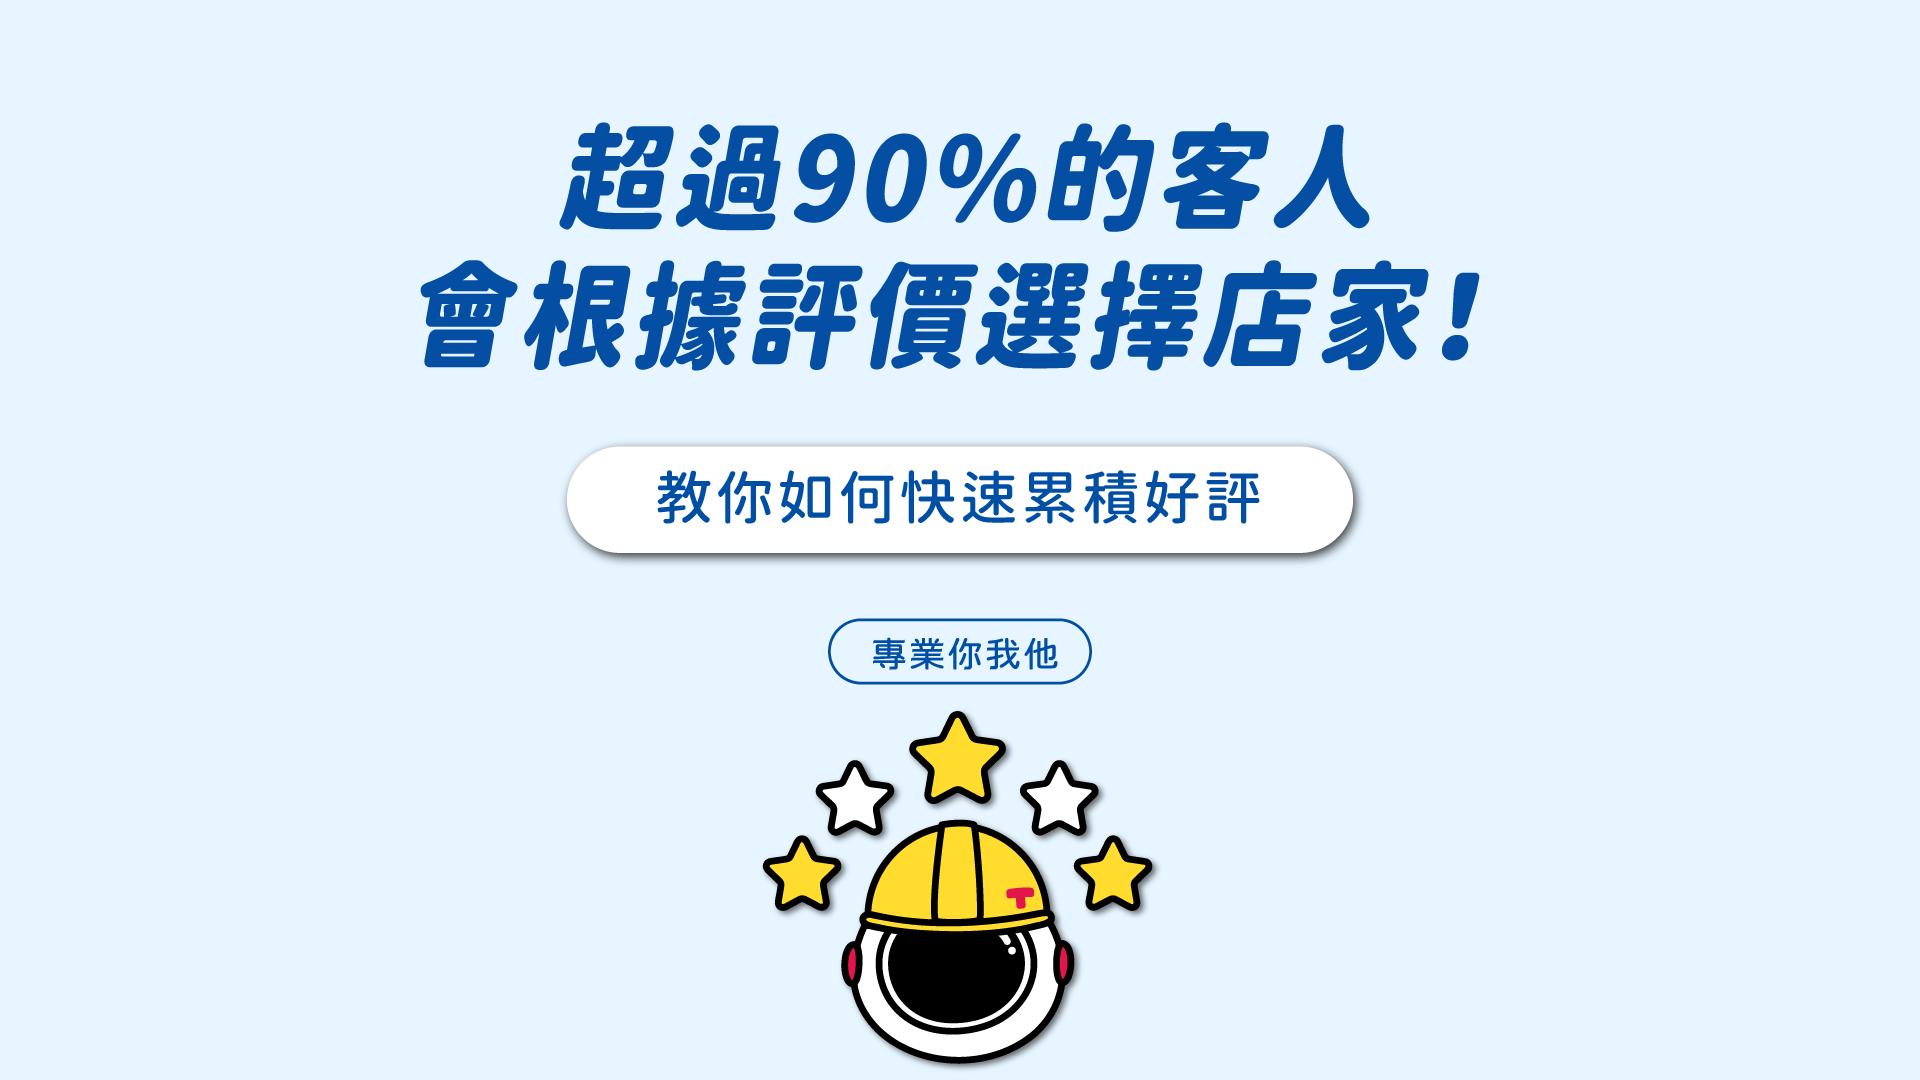 【Tasker找師傅】超過90%的客人,會根據評價選擇店家! 教你如何快速累積好評